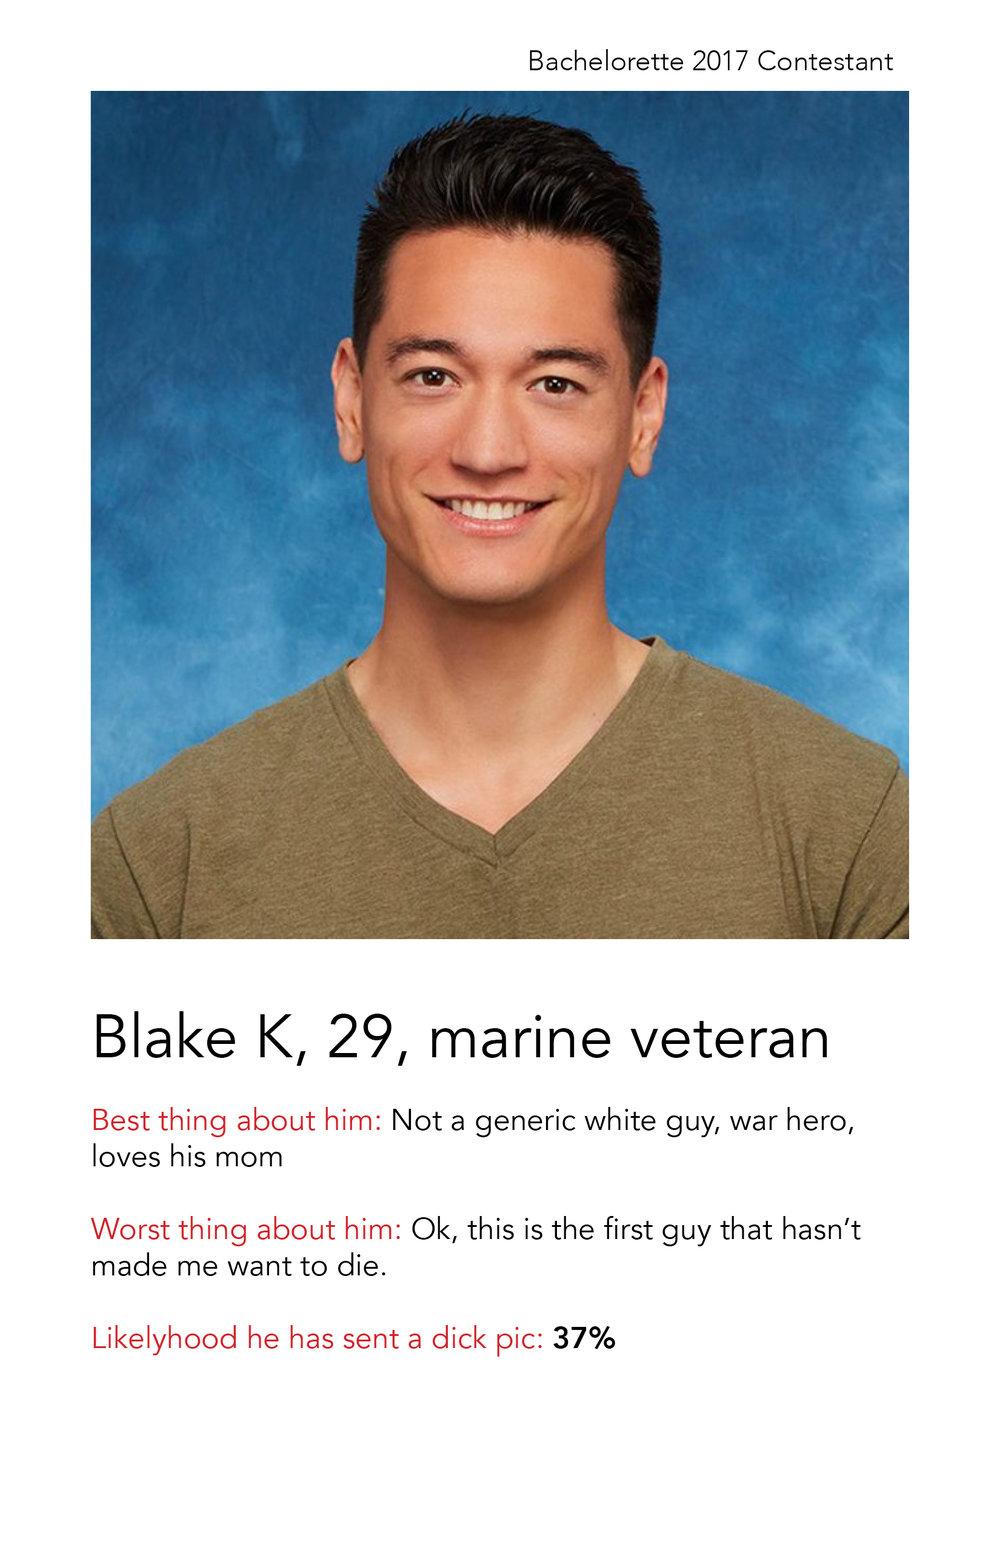 blake k.jpg